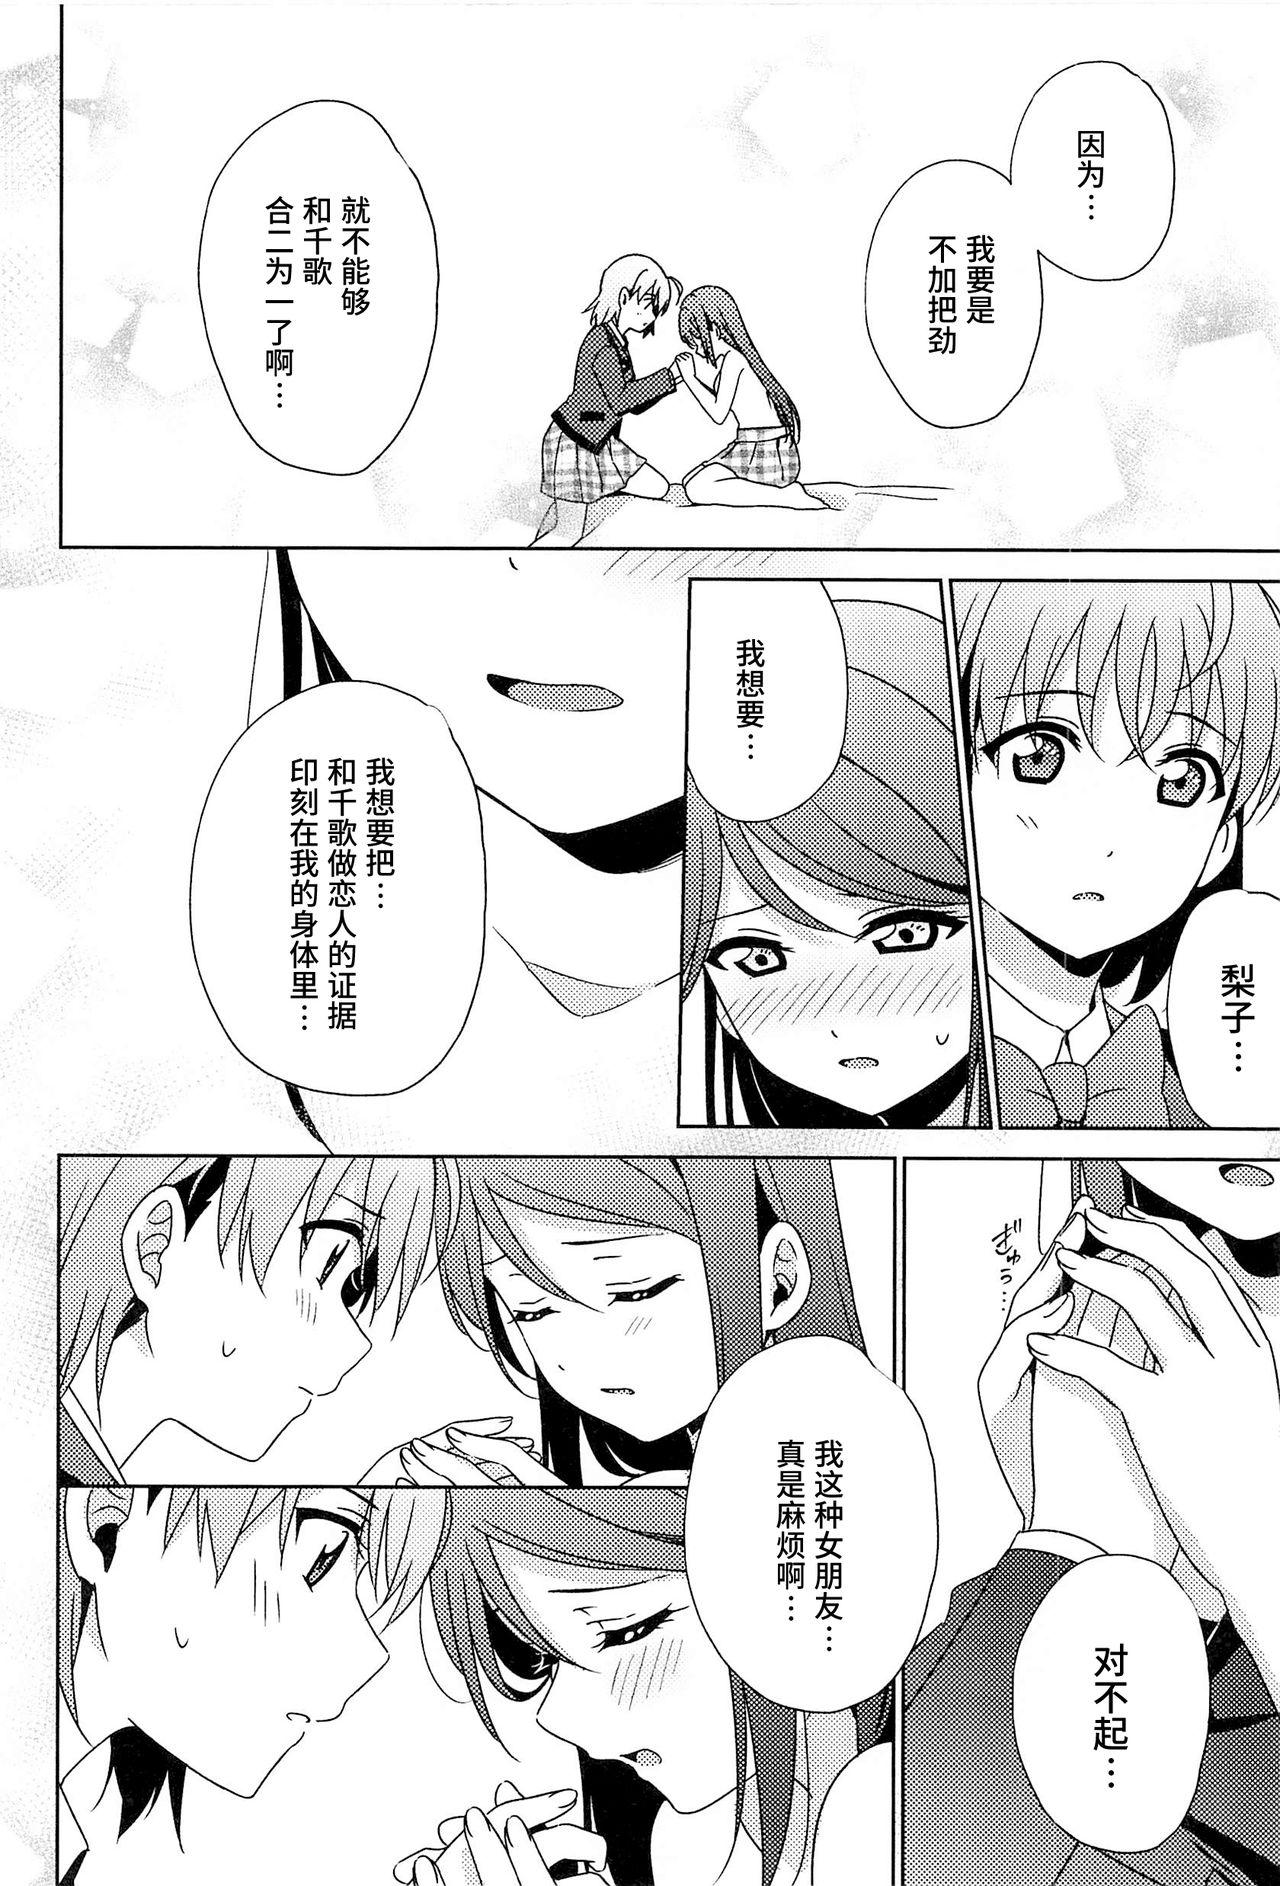 Chika-chan no ○○ ga Hairanai | 千歌的丁丁放不进来 19